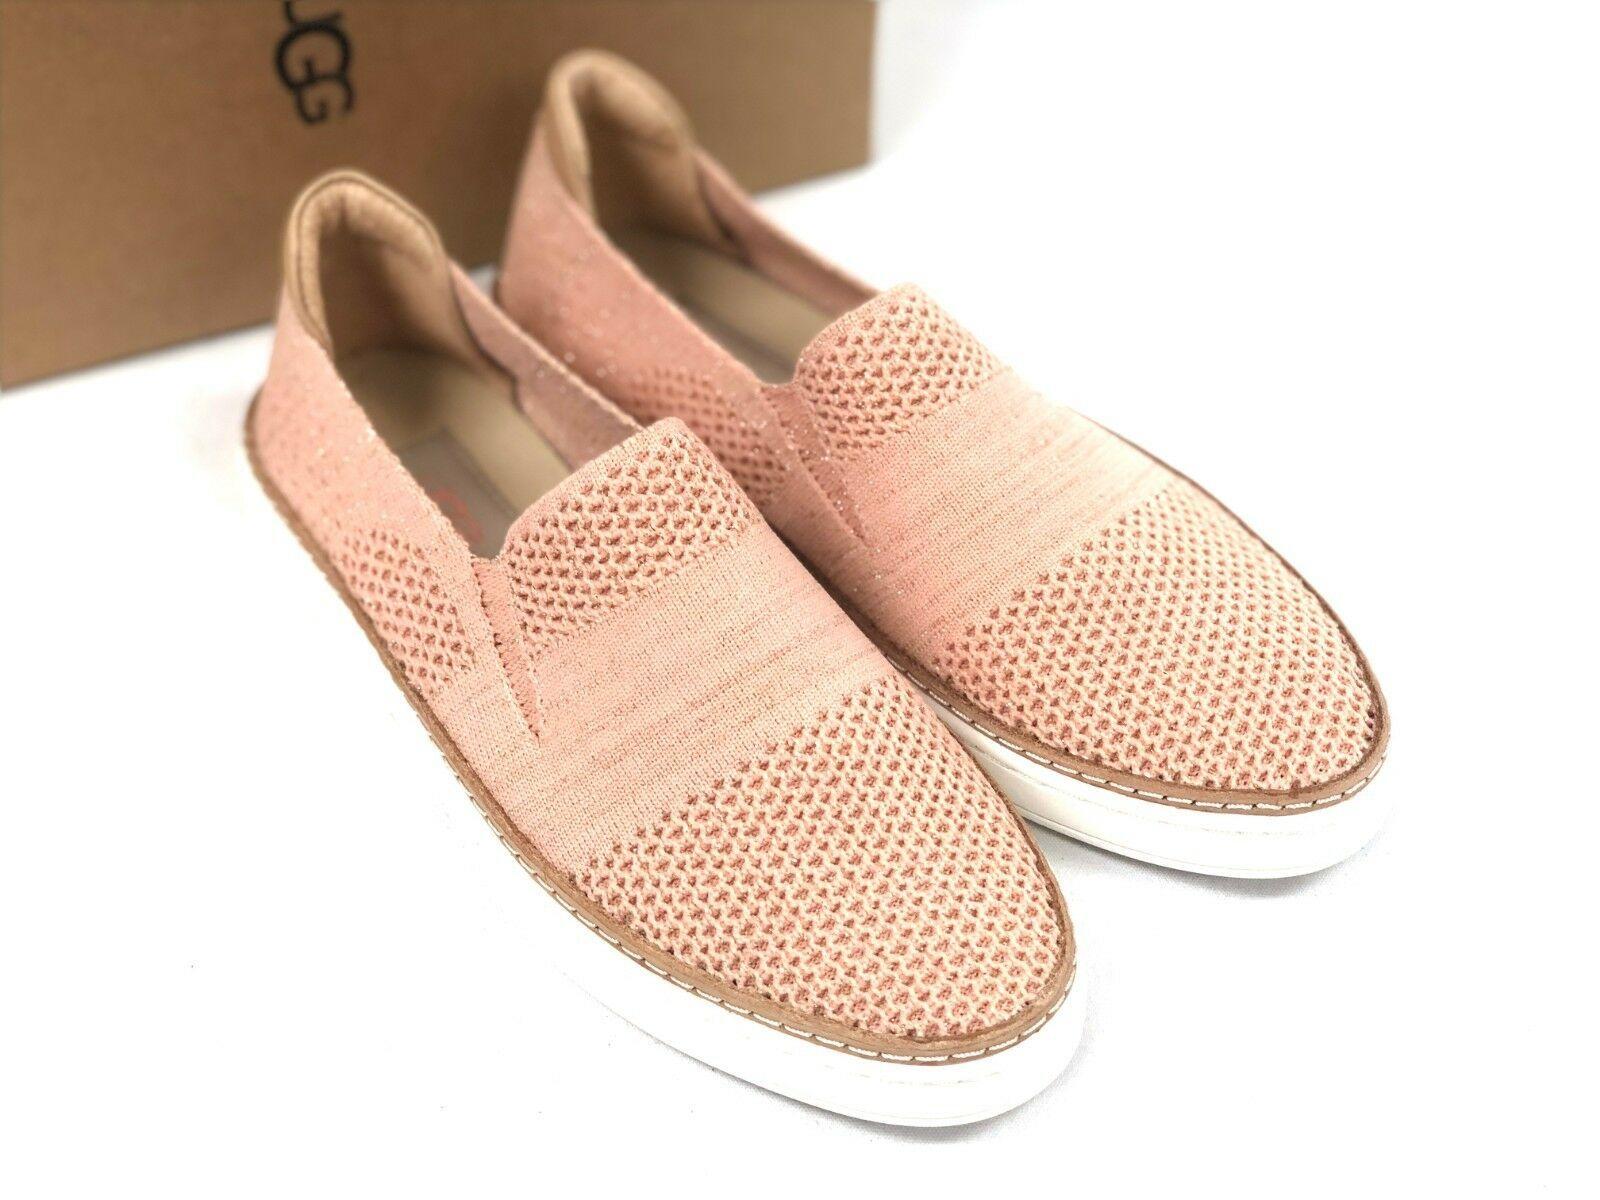 UGG Australia Sammy Metallic TROPICAL PEACH Slip On Shoe Casual Sneakers 1096249